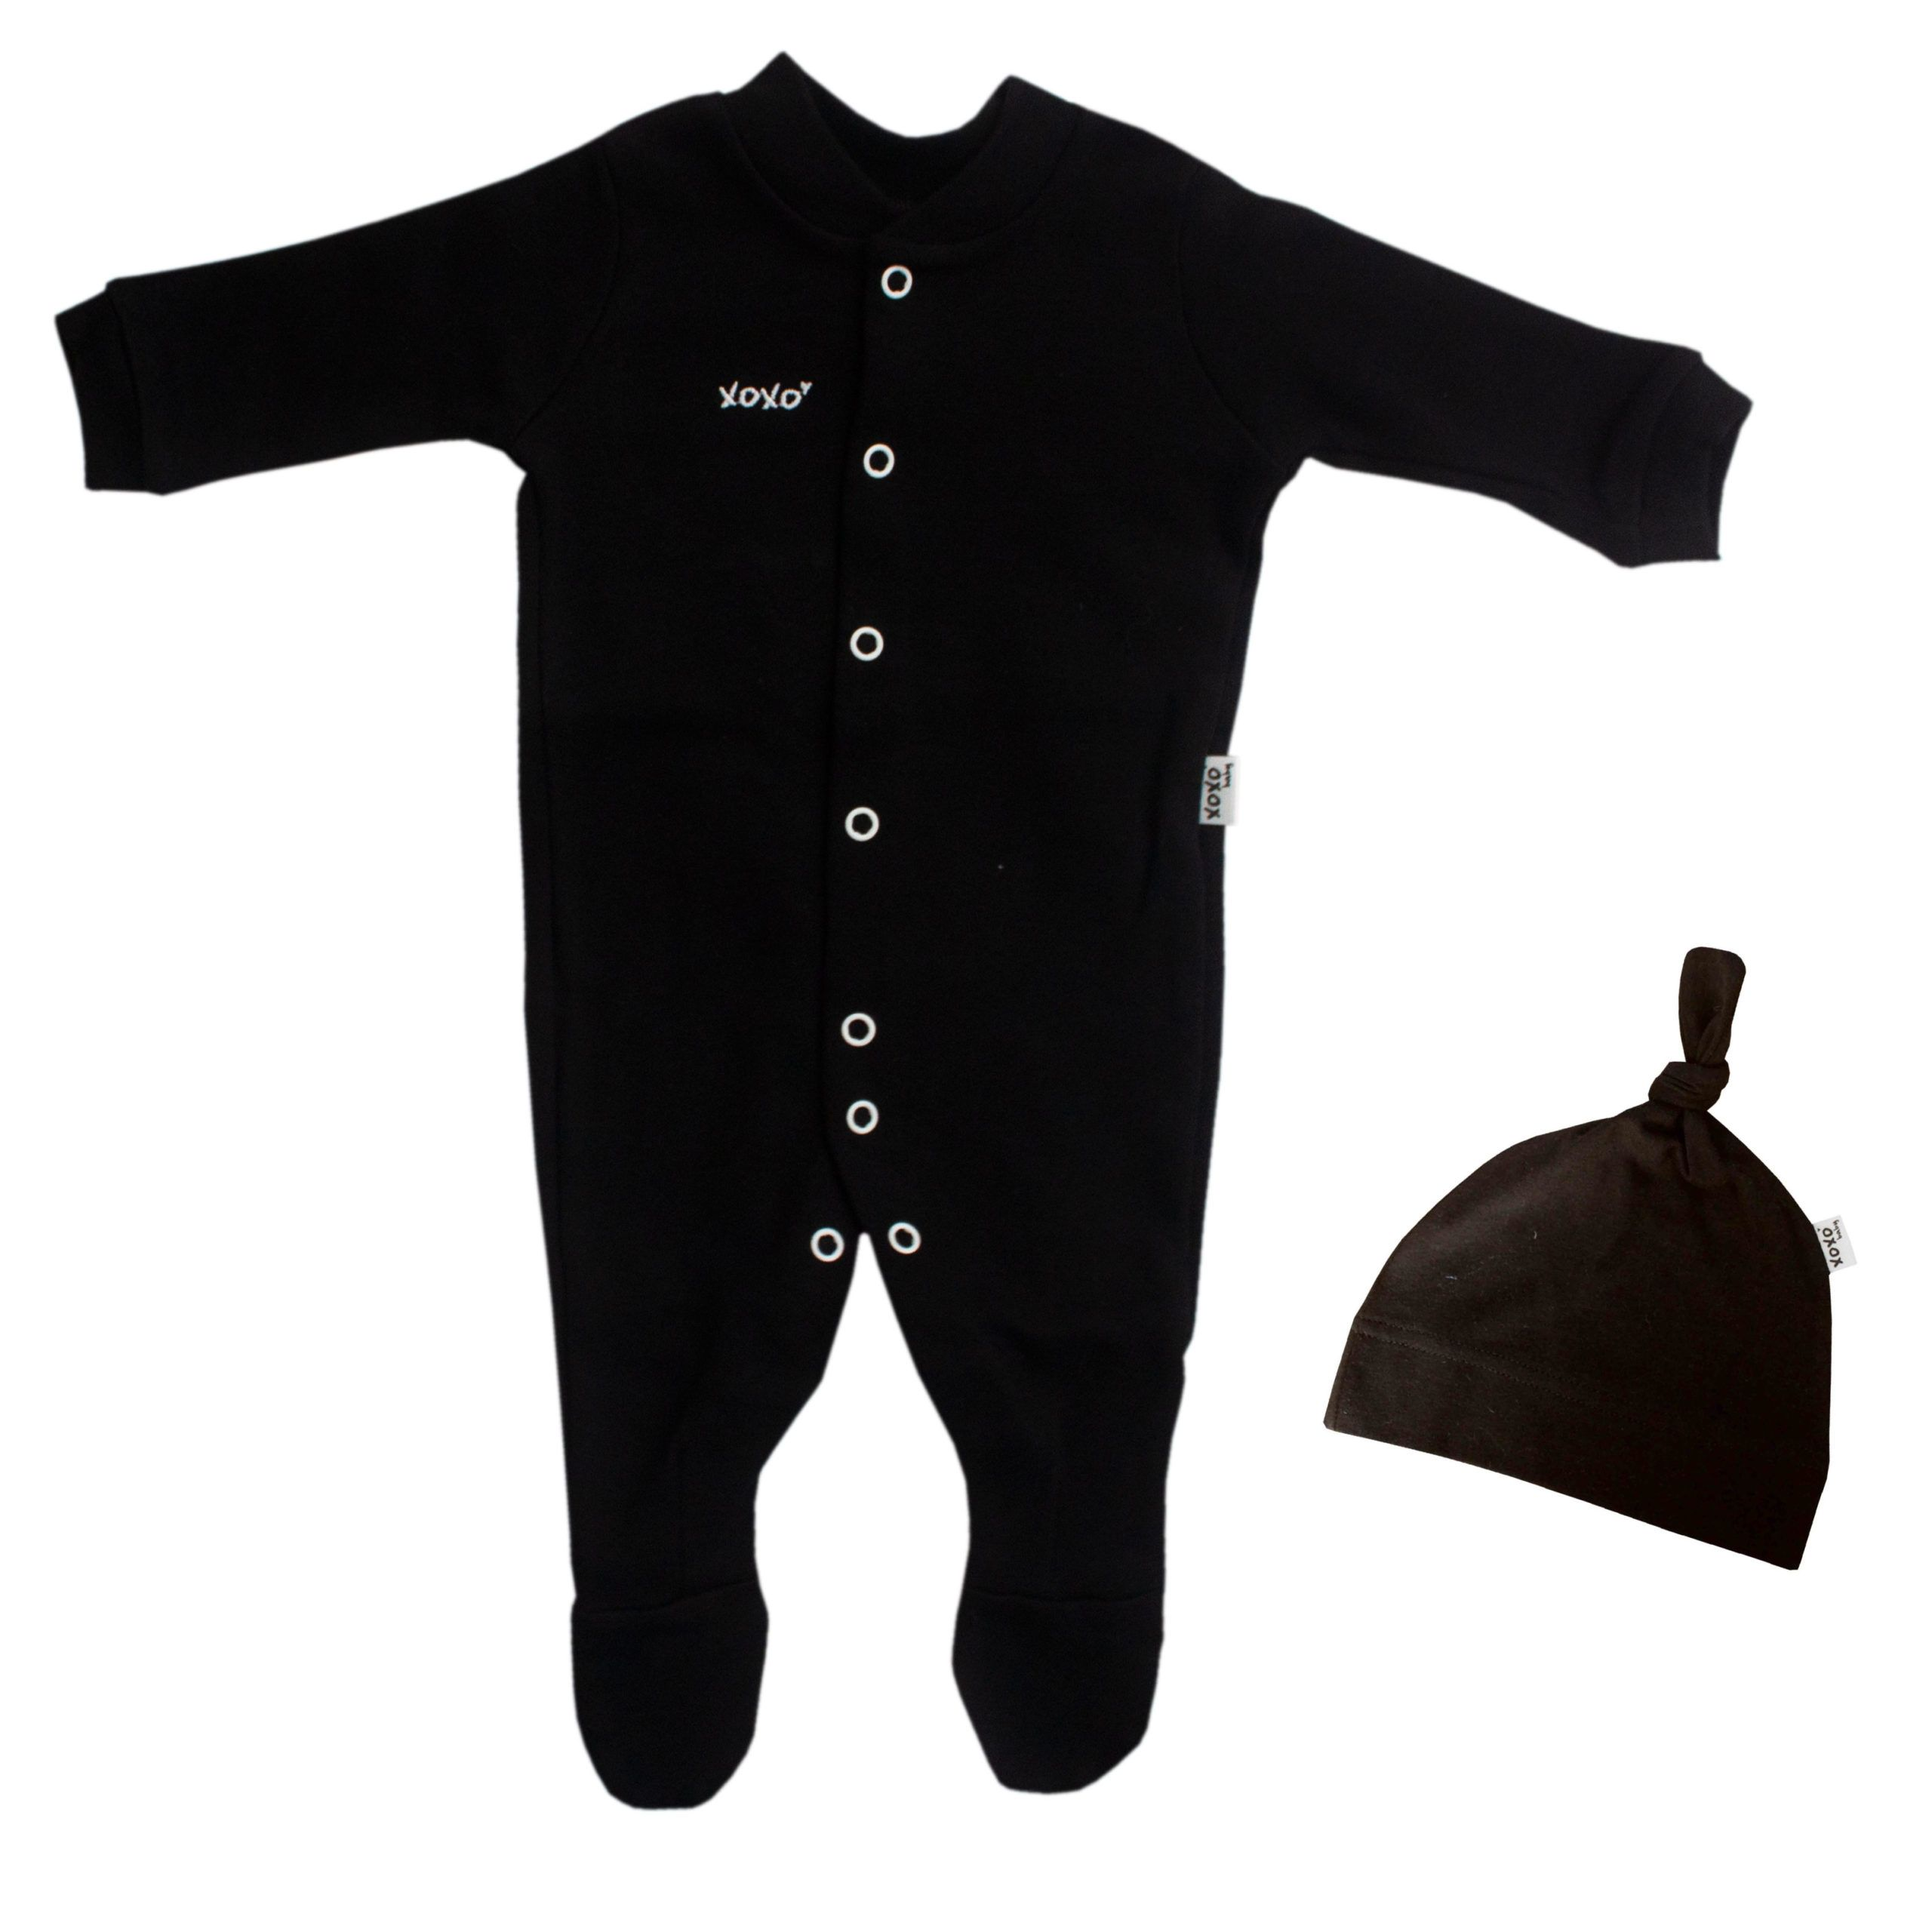 black babygro set - 0-3 months